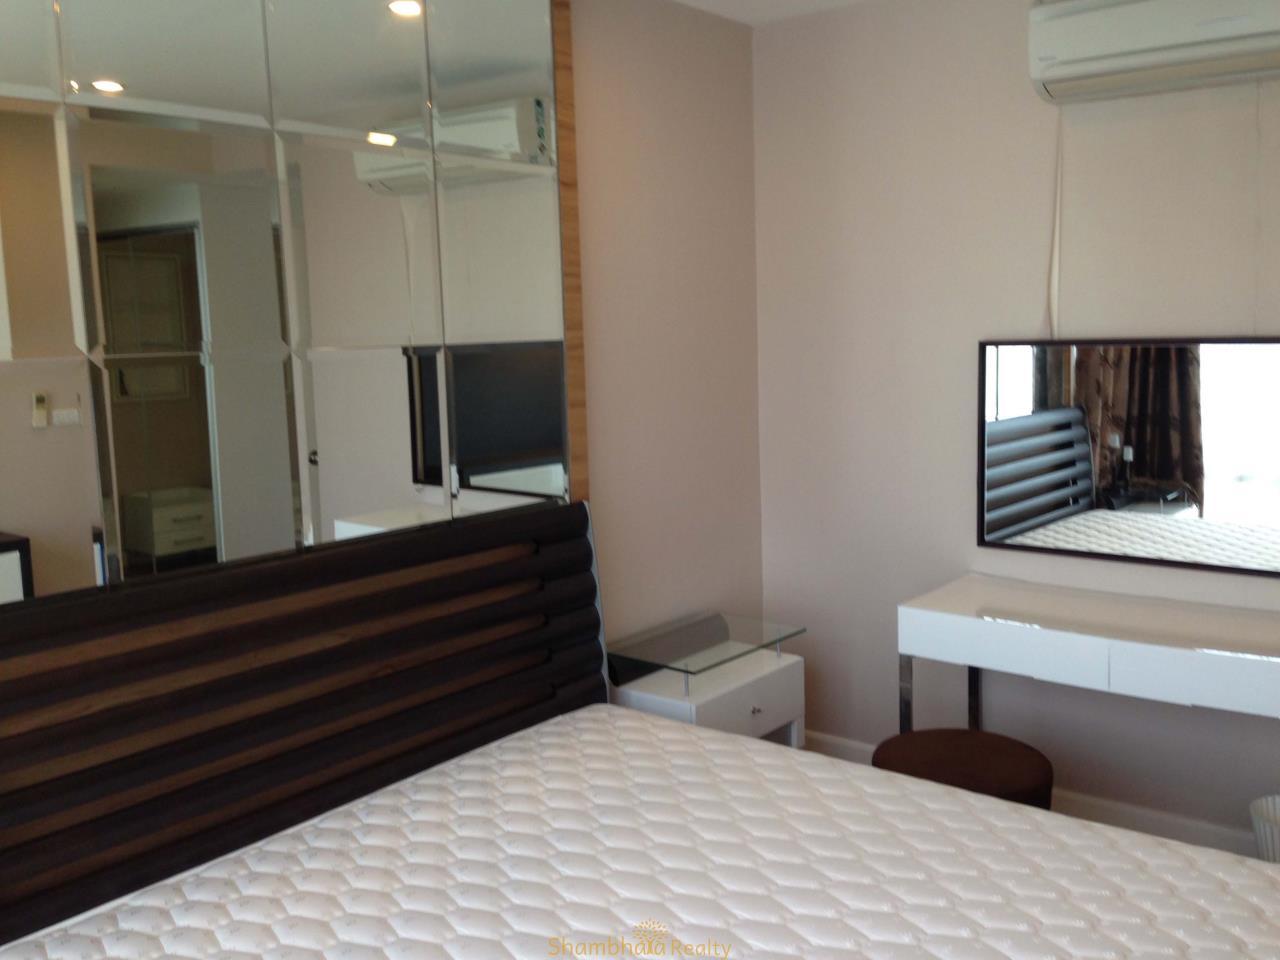 Shambhala Realty Agency's Baan Siri 31 Condominium for Sale in Sukhumvit 31 4